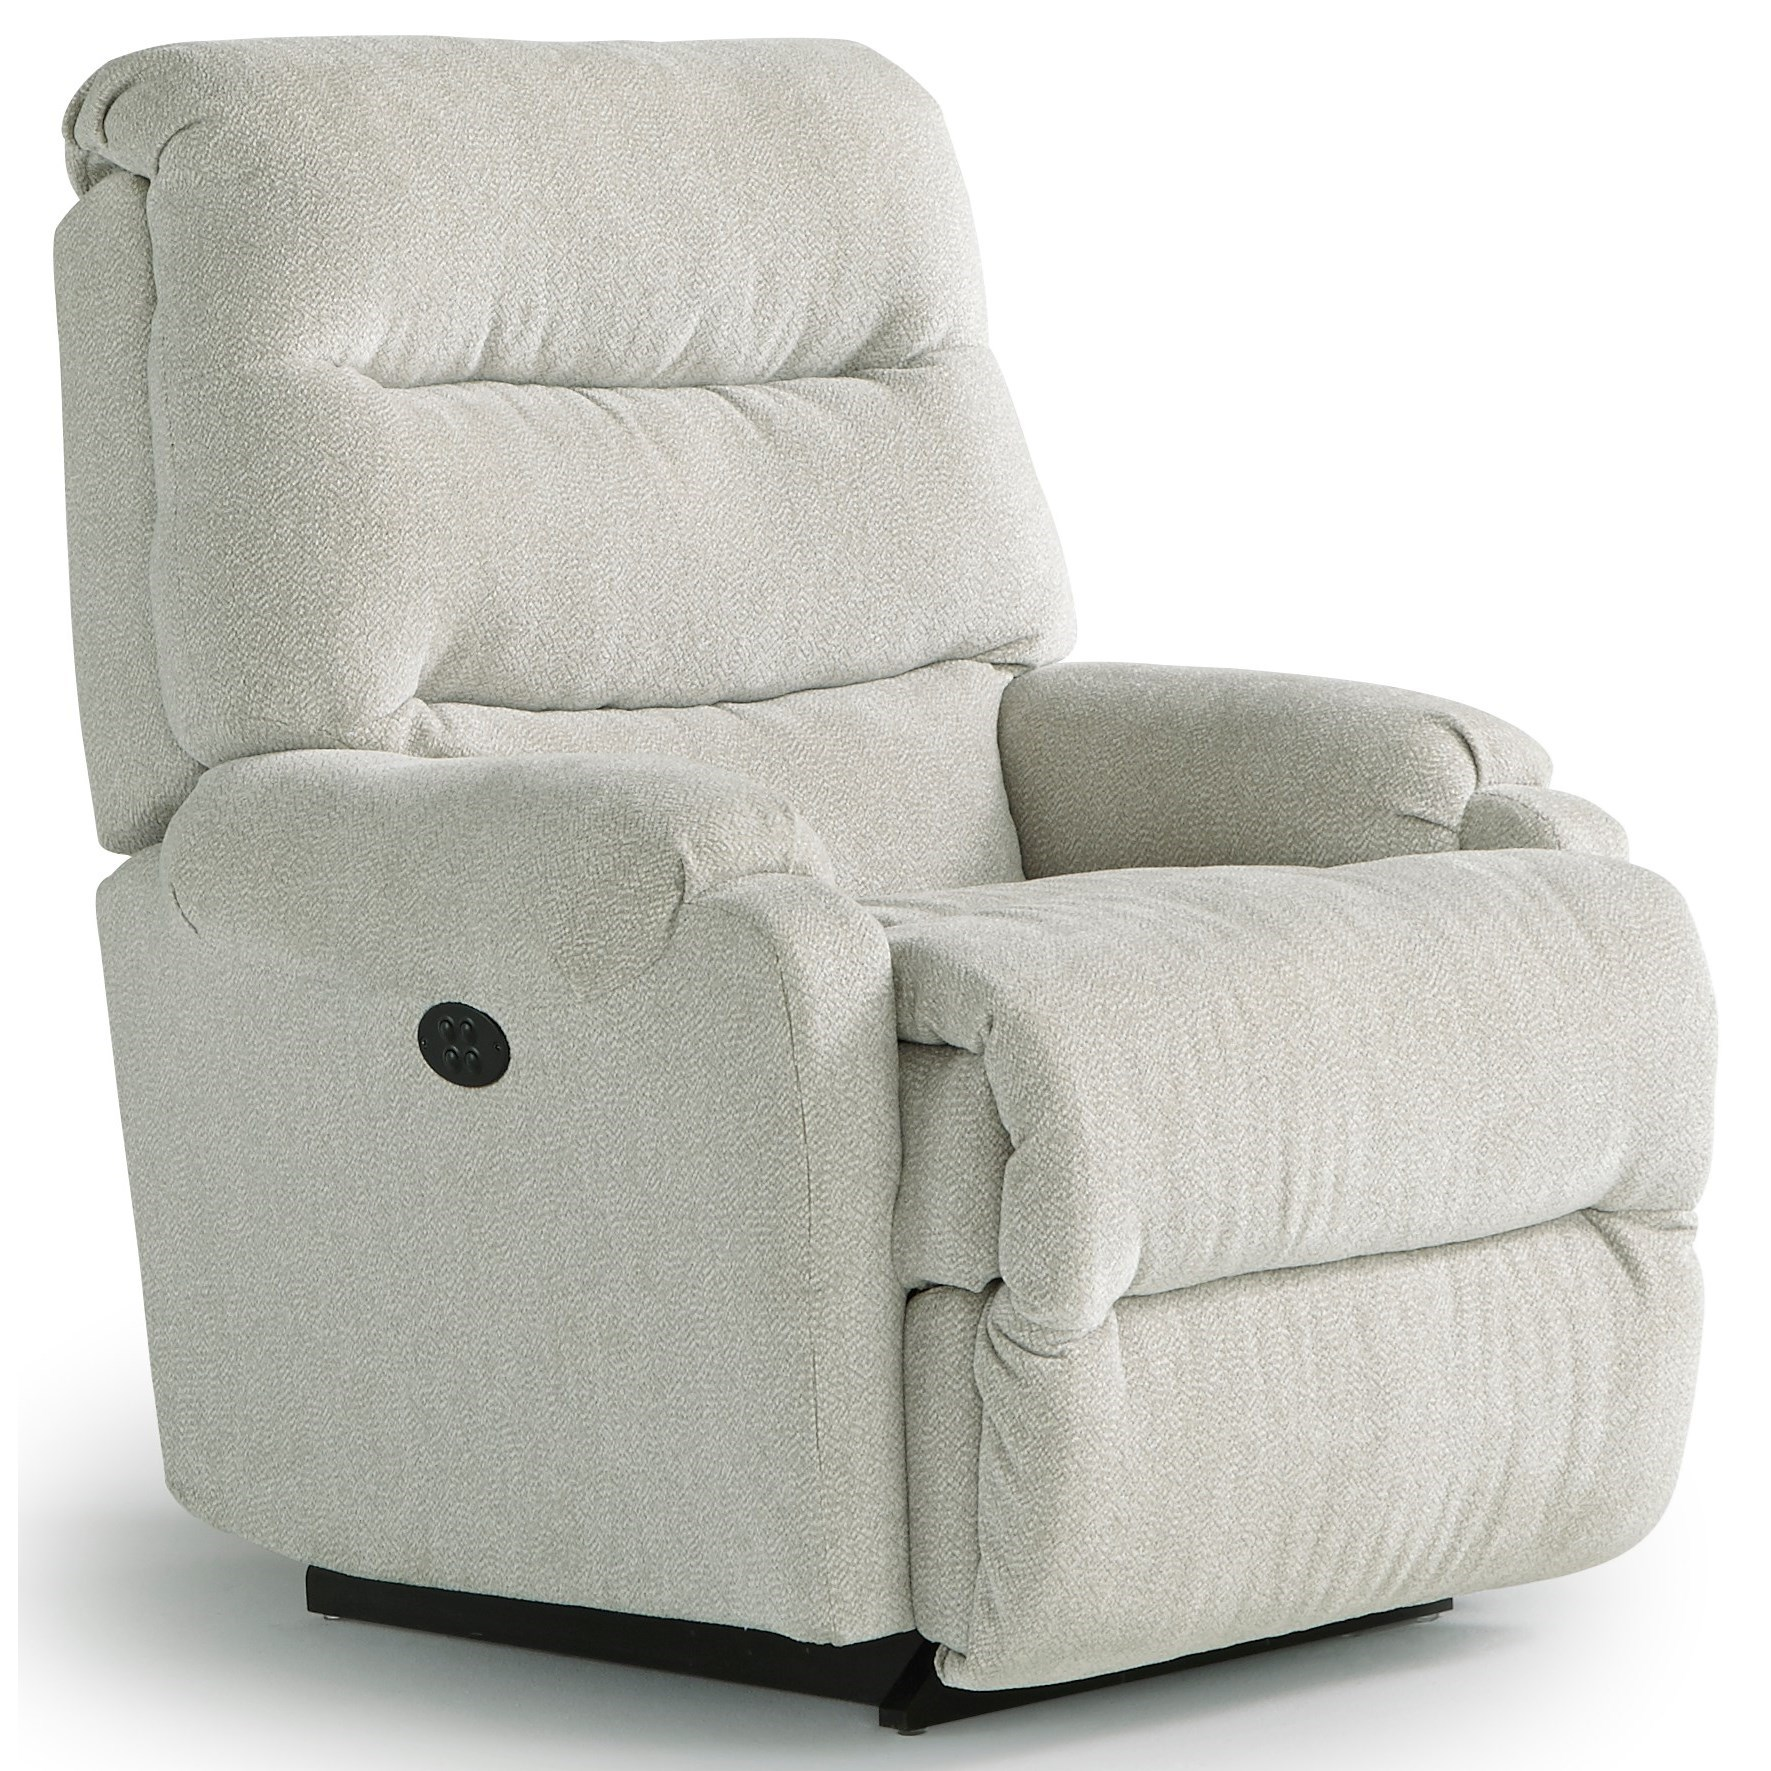 Petite Recliners Sedgefield Rocker Recliner by Best Home Furnishings at Baer's Furniture